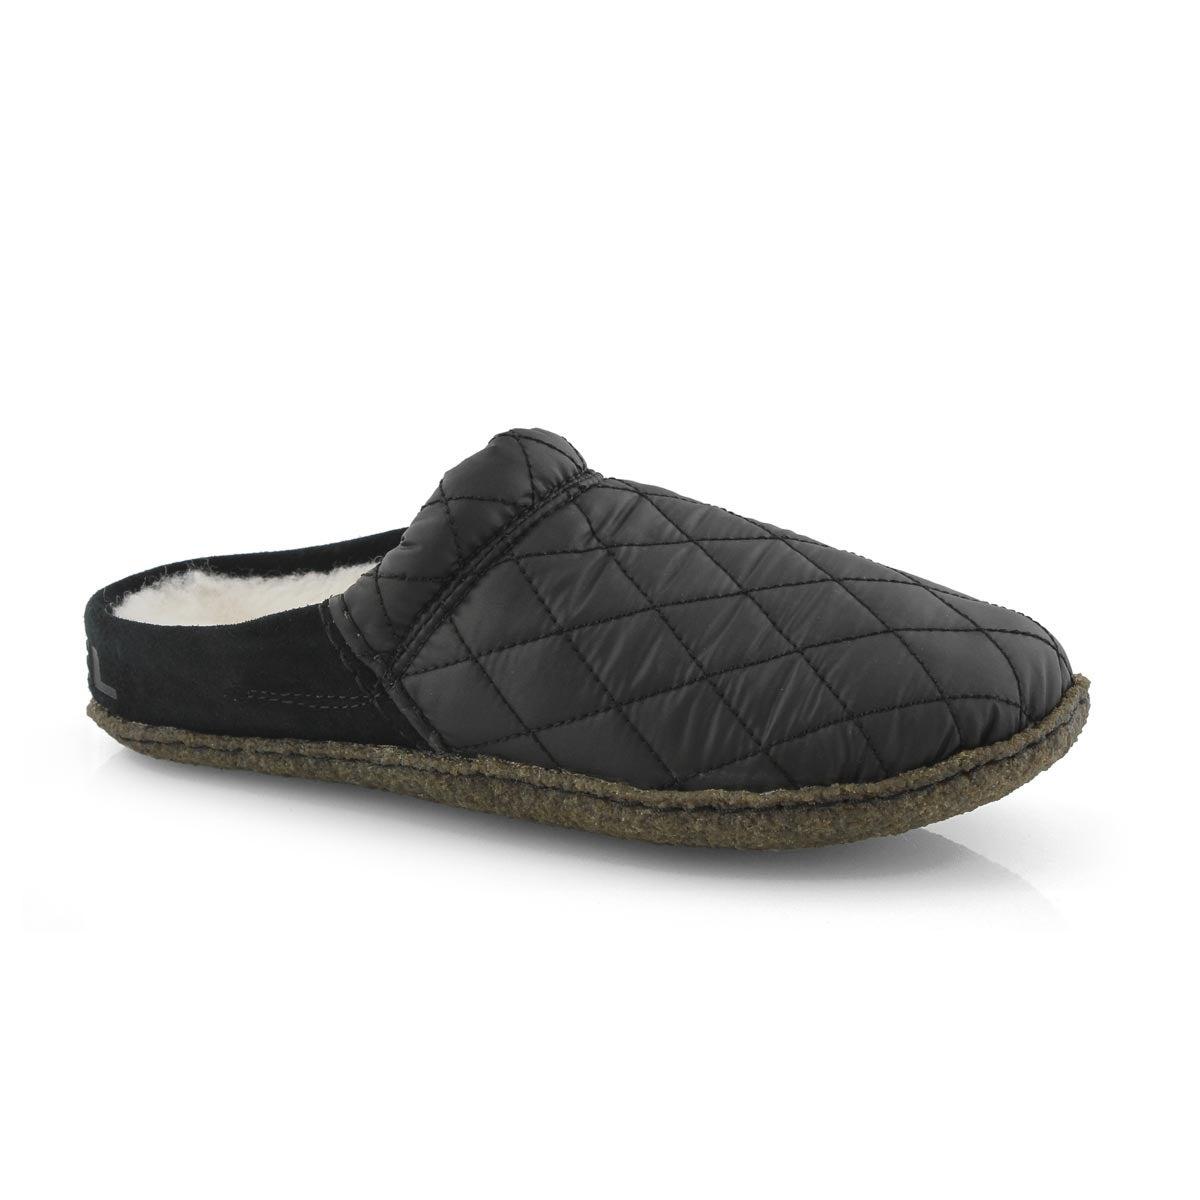 Women's NAKISKA SCUFF black slippers